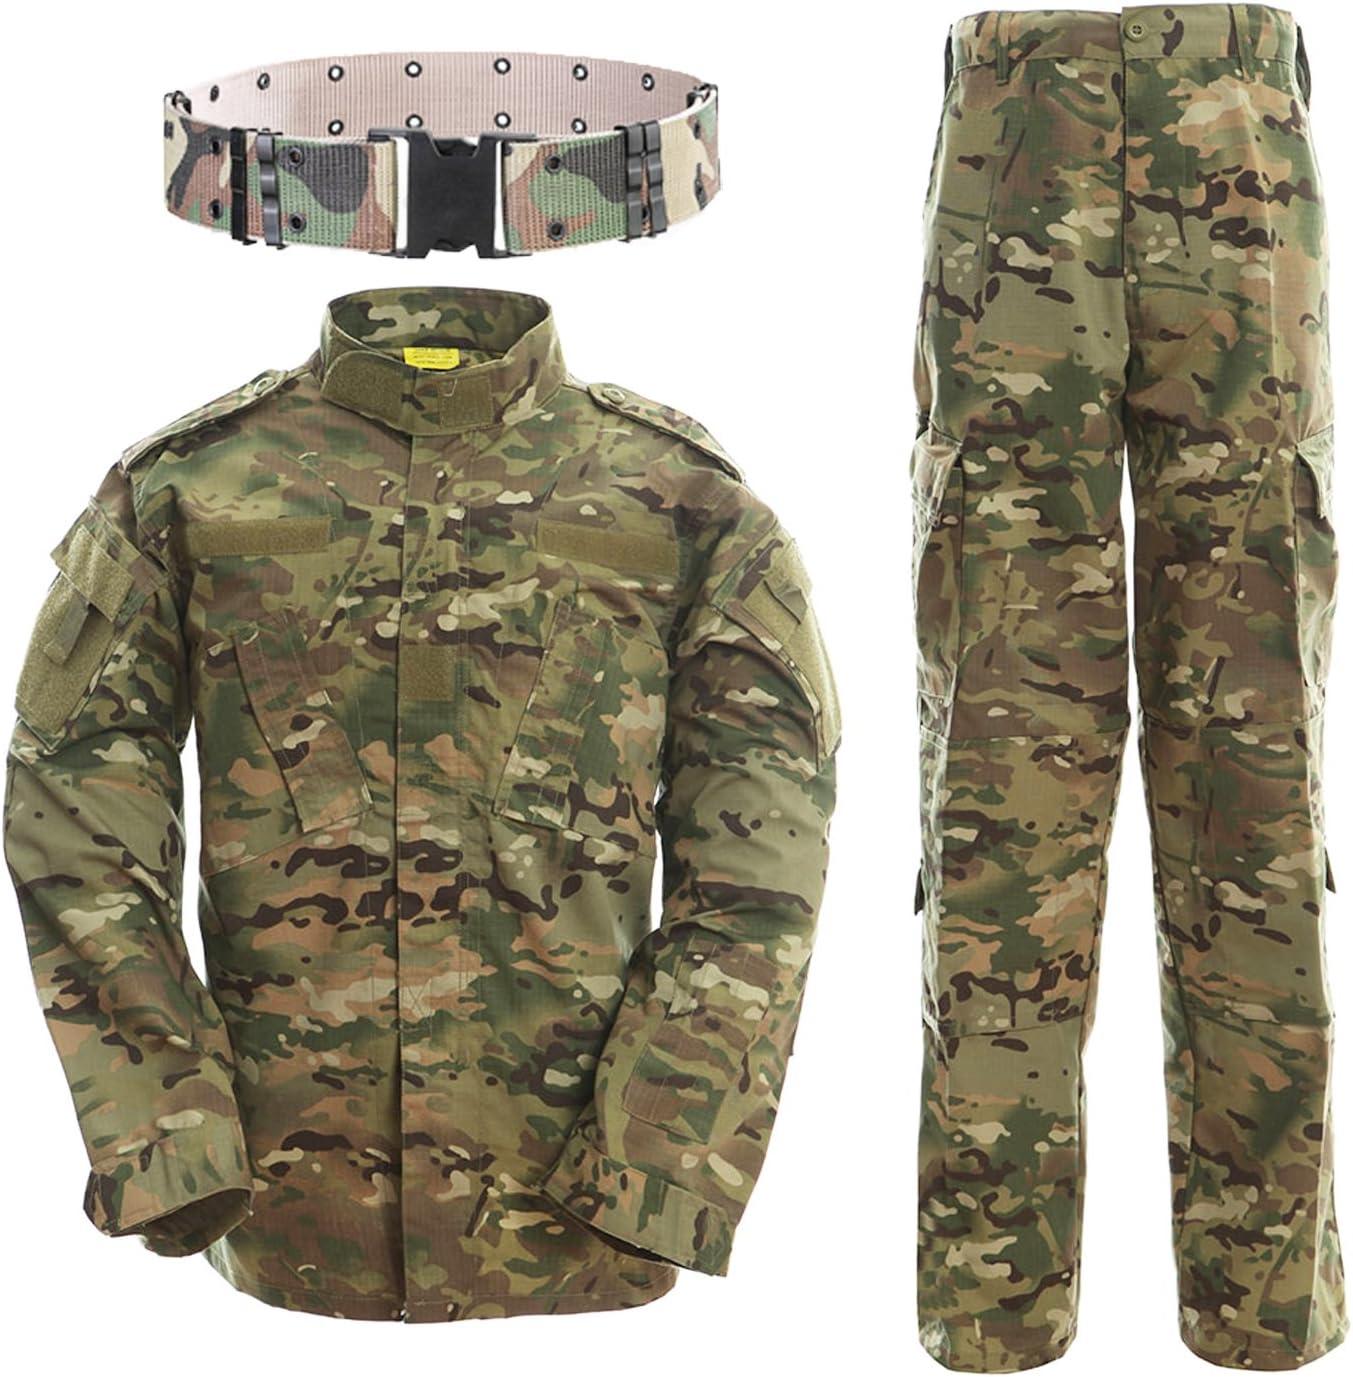 QMFIVE Uniformes tácticos Camuflaje Camo Camo Combat BDU Chaqueta Camisa y Pantalones Uniforme Juego de Guerra Ejército Paintball Militar Airsoft Caza Disparo Camo